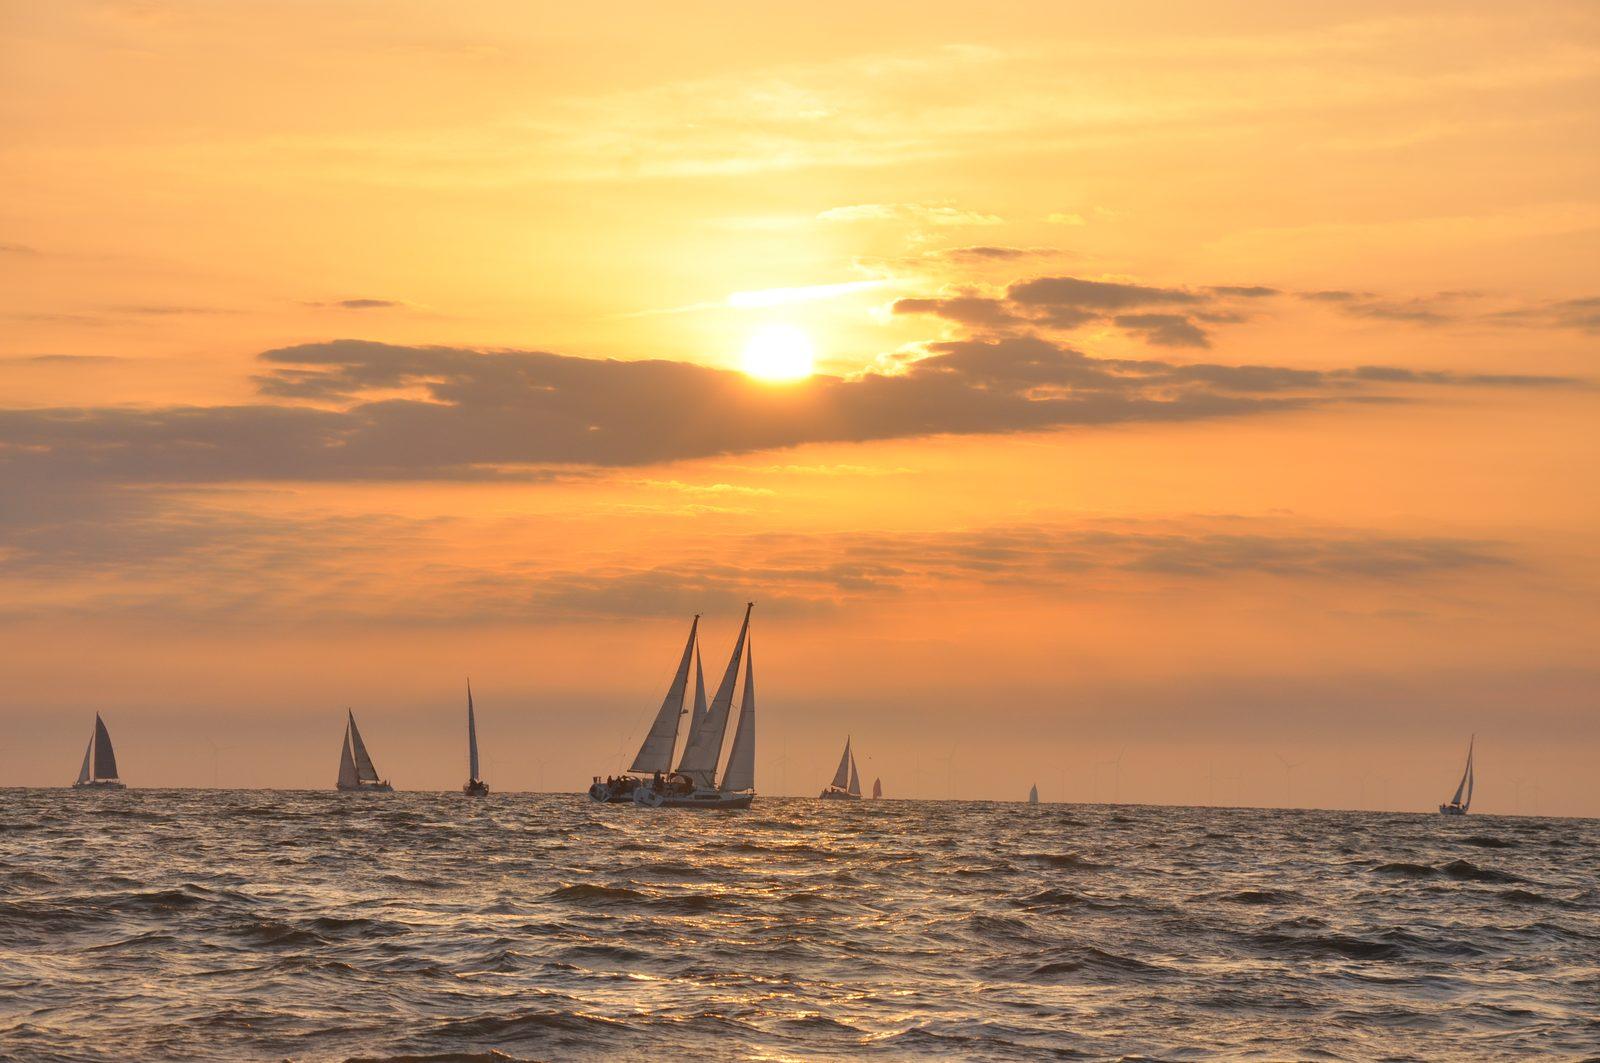 International Sailing Center Medemblik